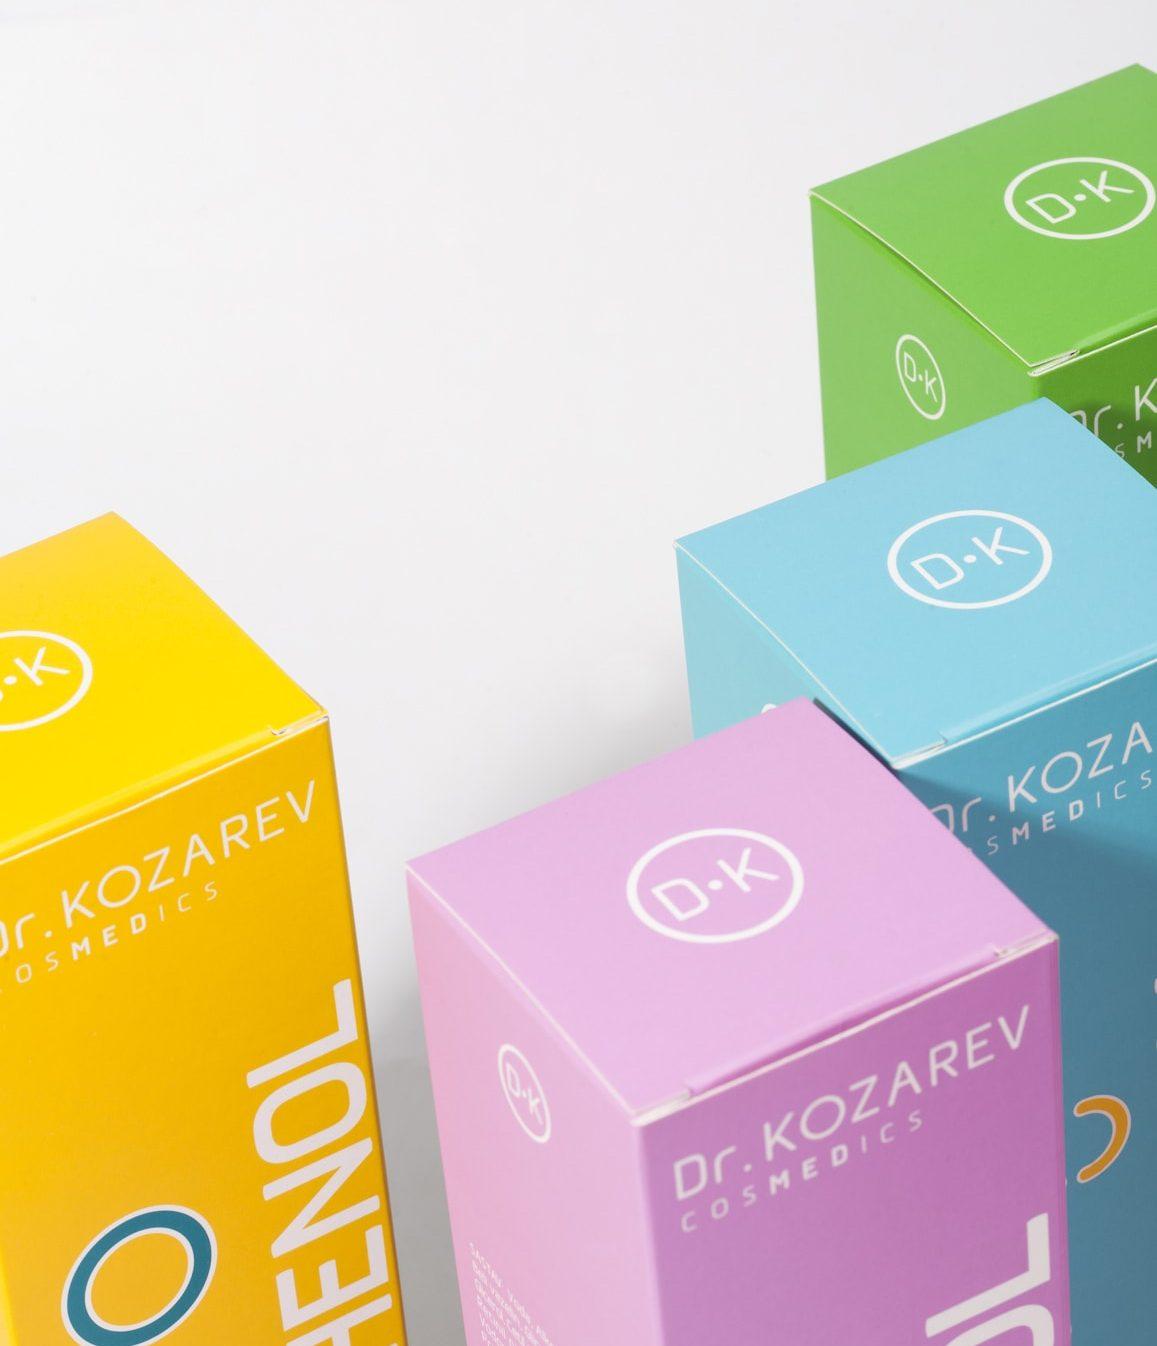 DrKozarev_Cosmetics_Shonski_packaging_MedBeautyLine_detail_2